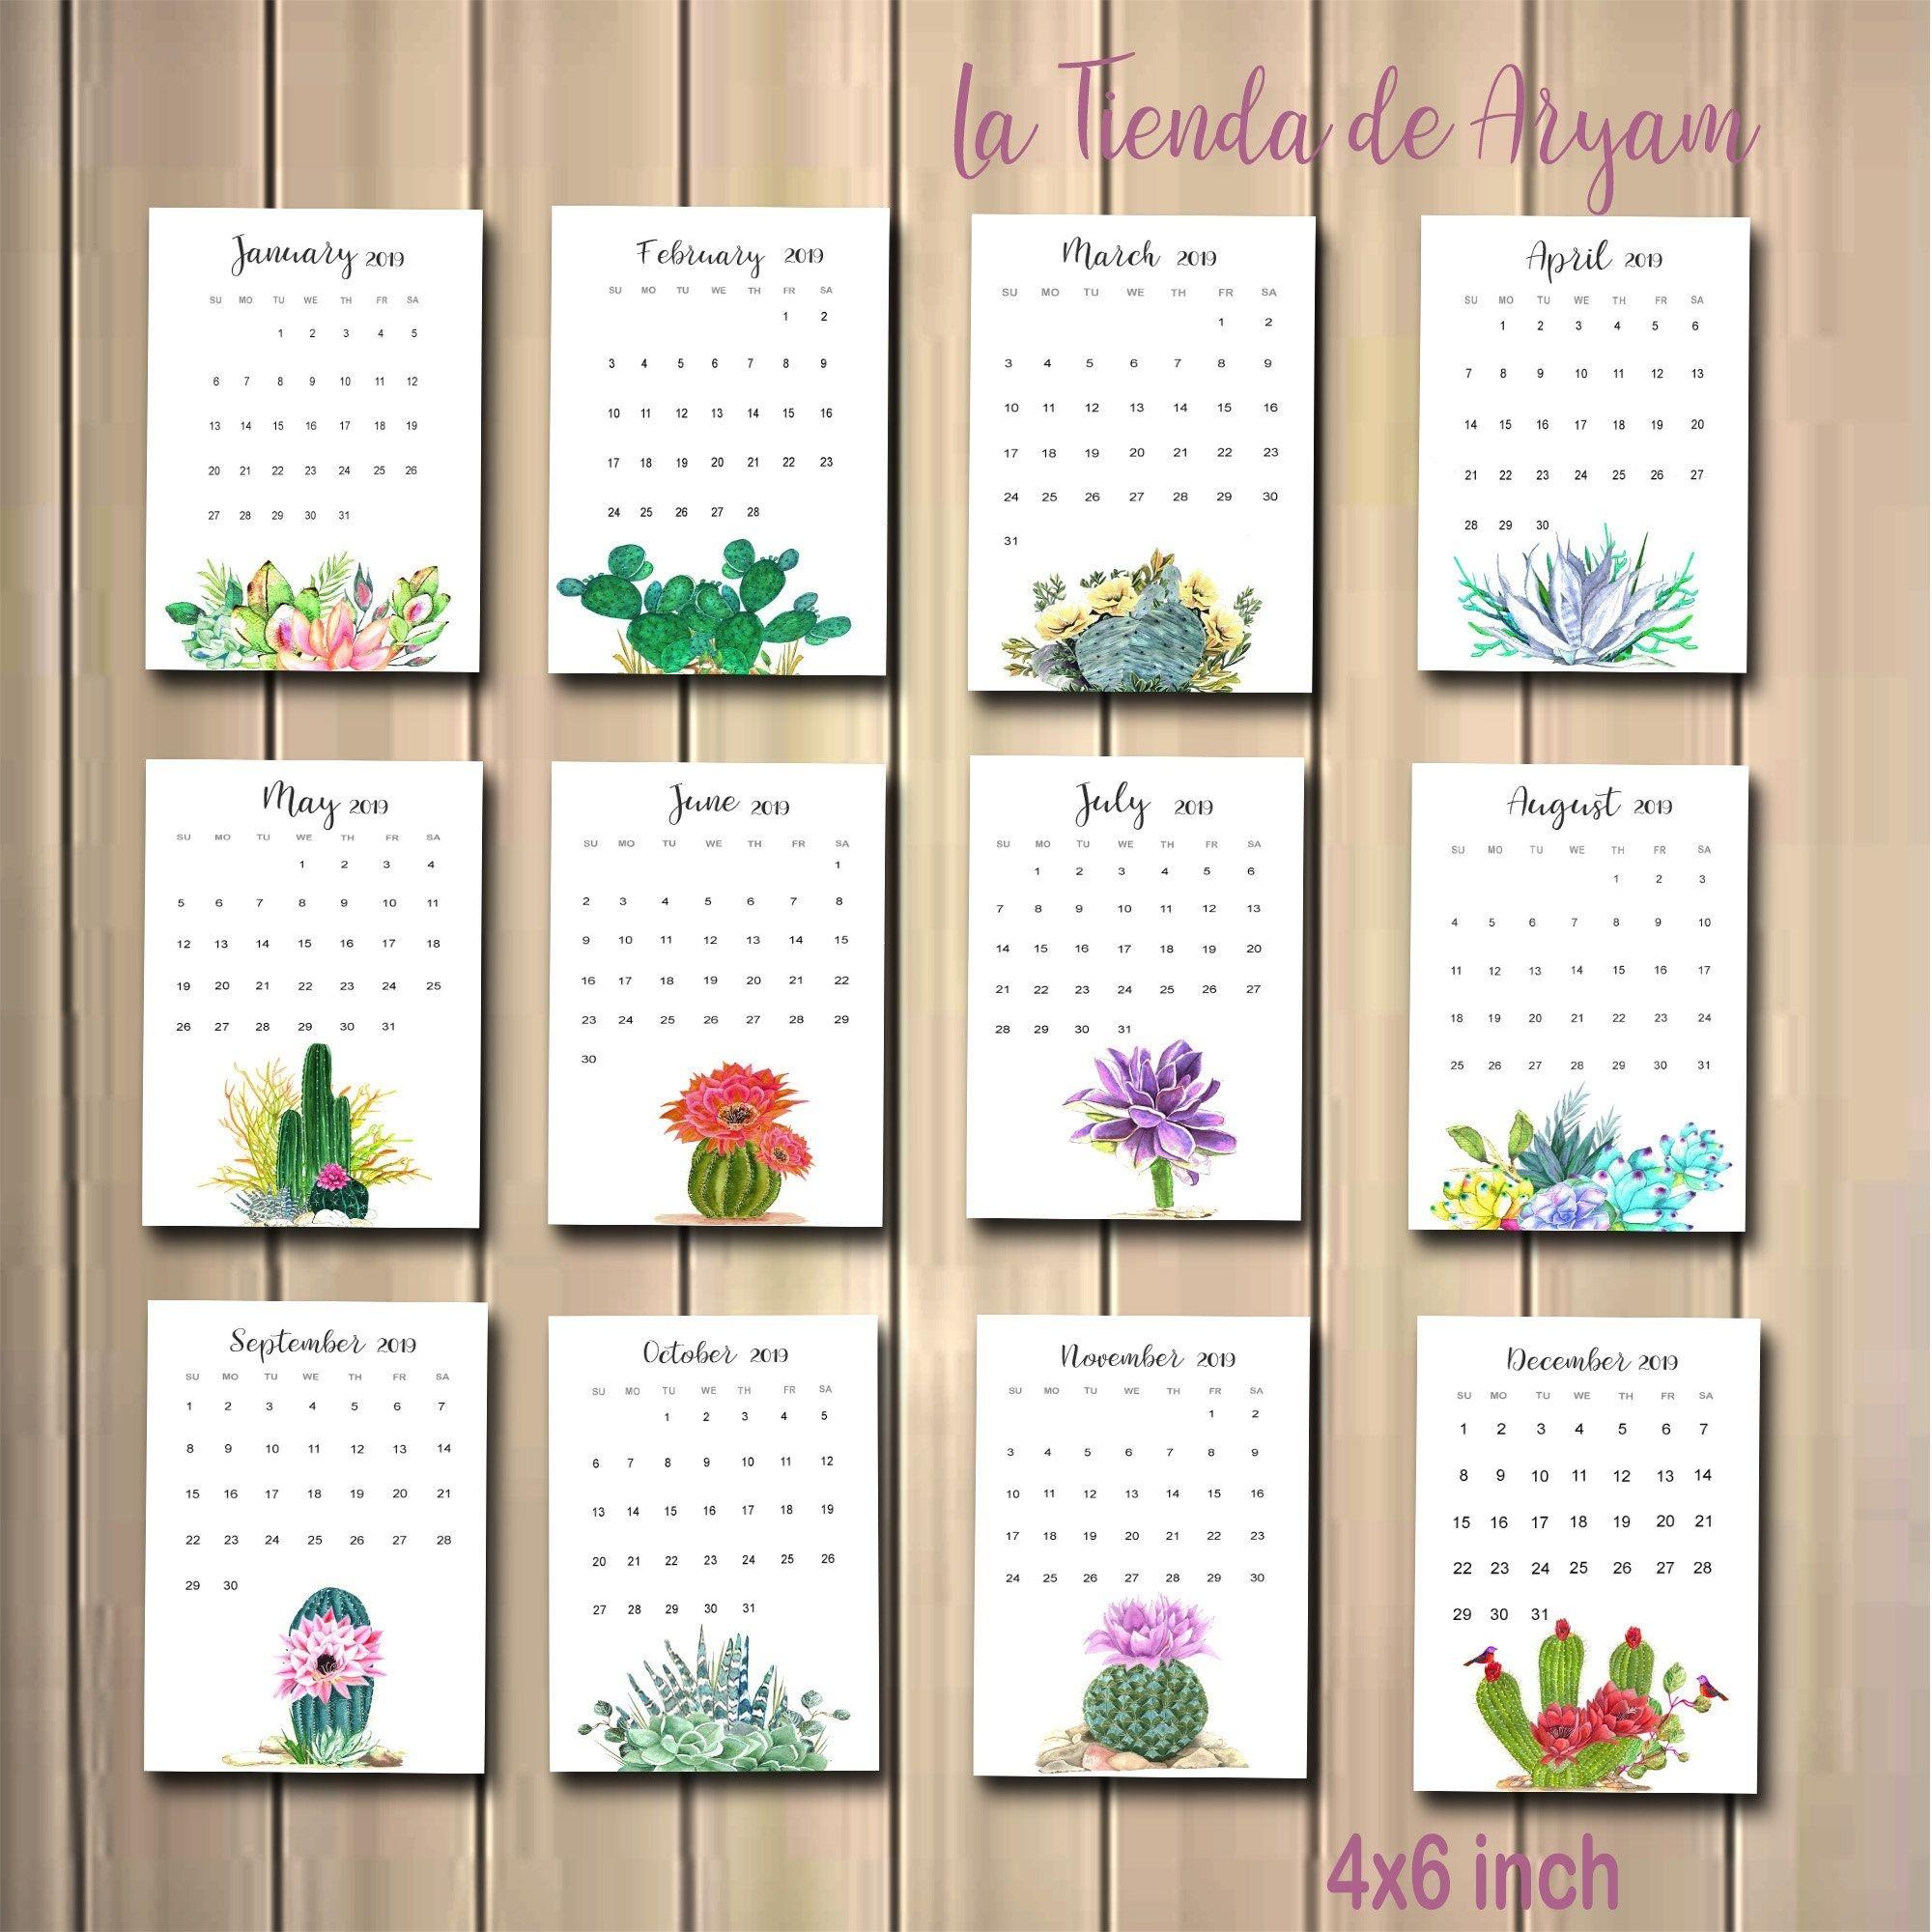 Printable 2021 Calendar Cactus Cactus In Pots Desk Calendar-4X6 Printable Calendar 2021 Free